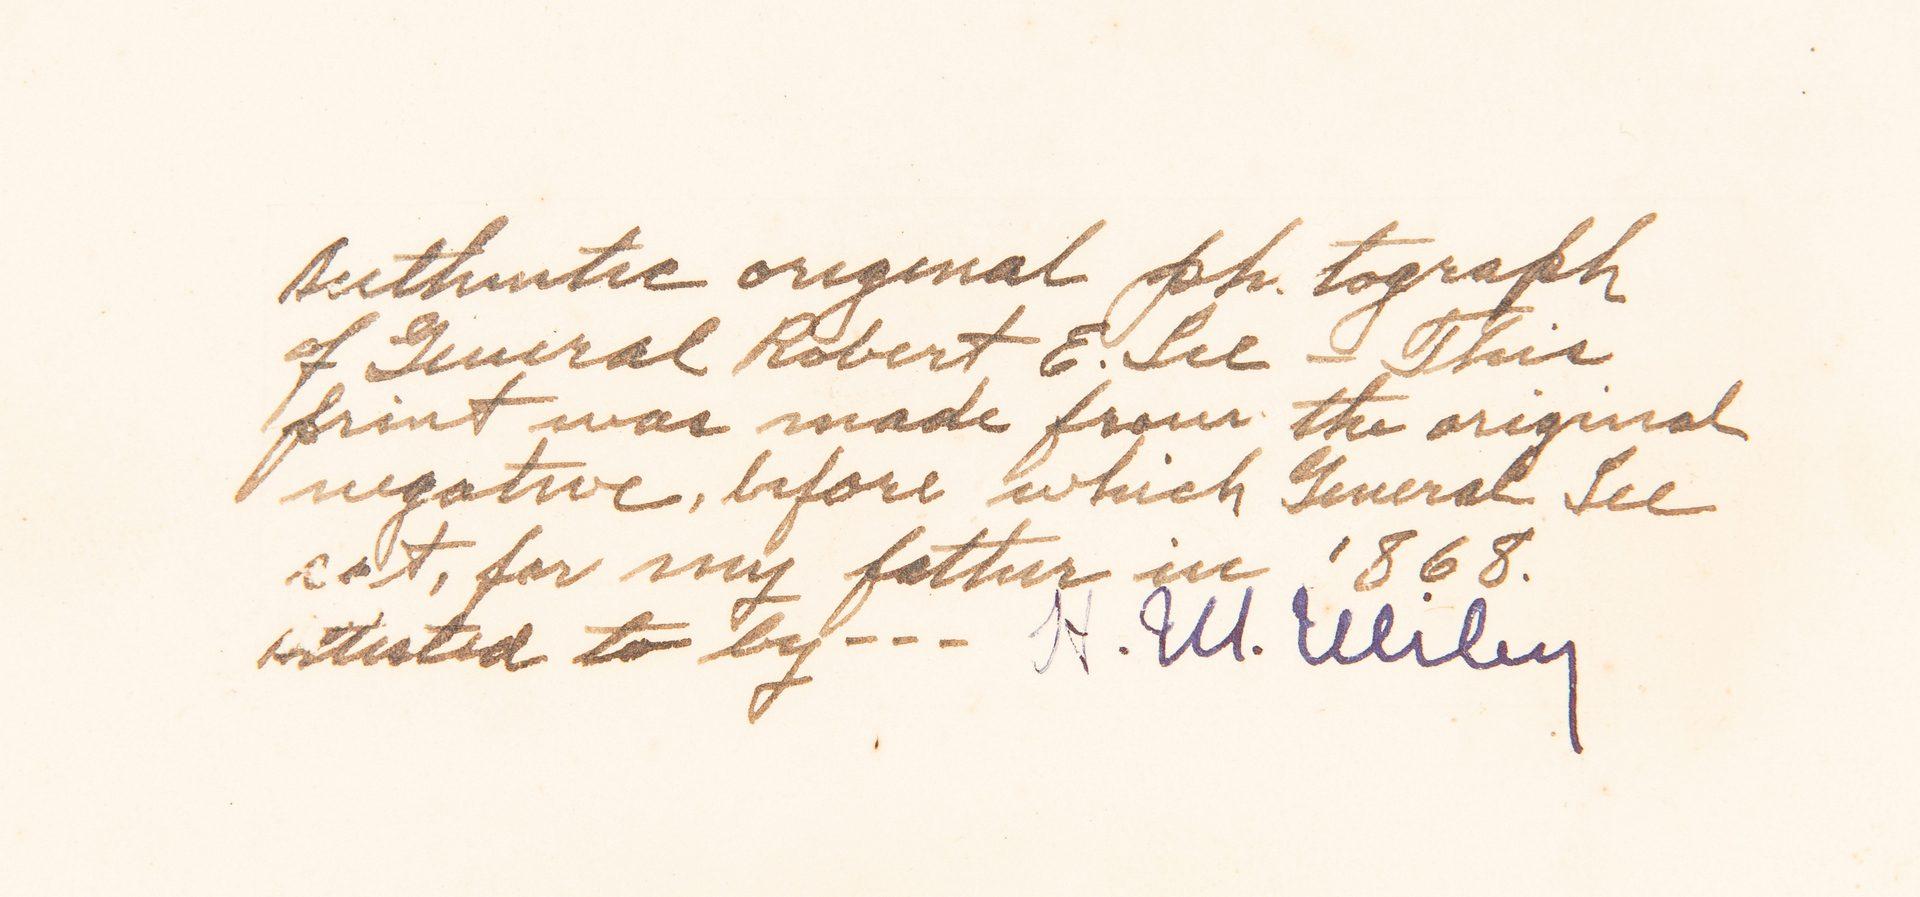 Lot 363: Robert E. Lee Photograph, Miley & Son